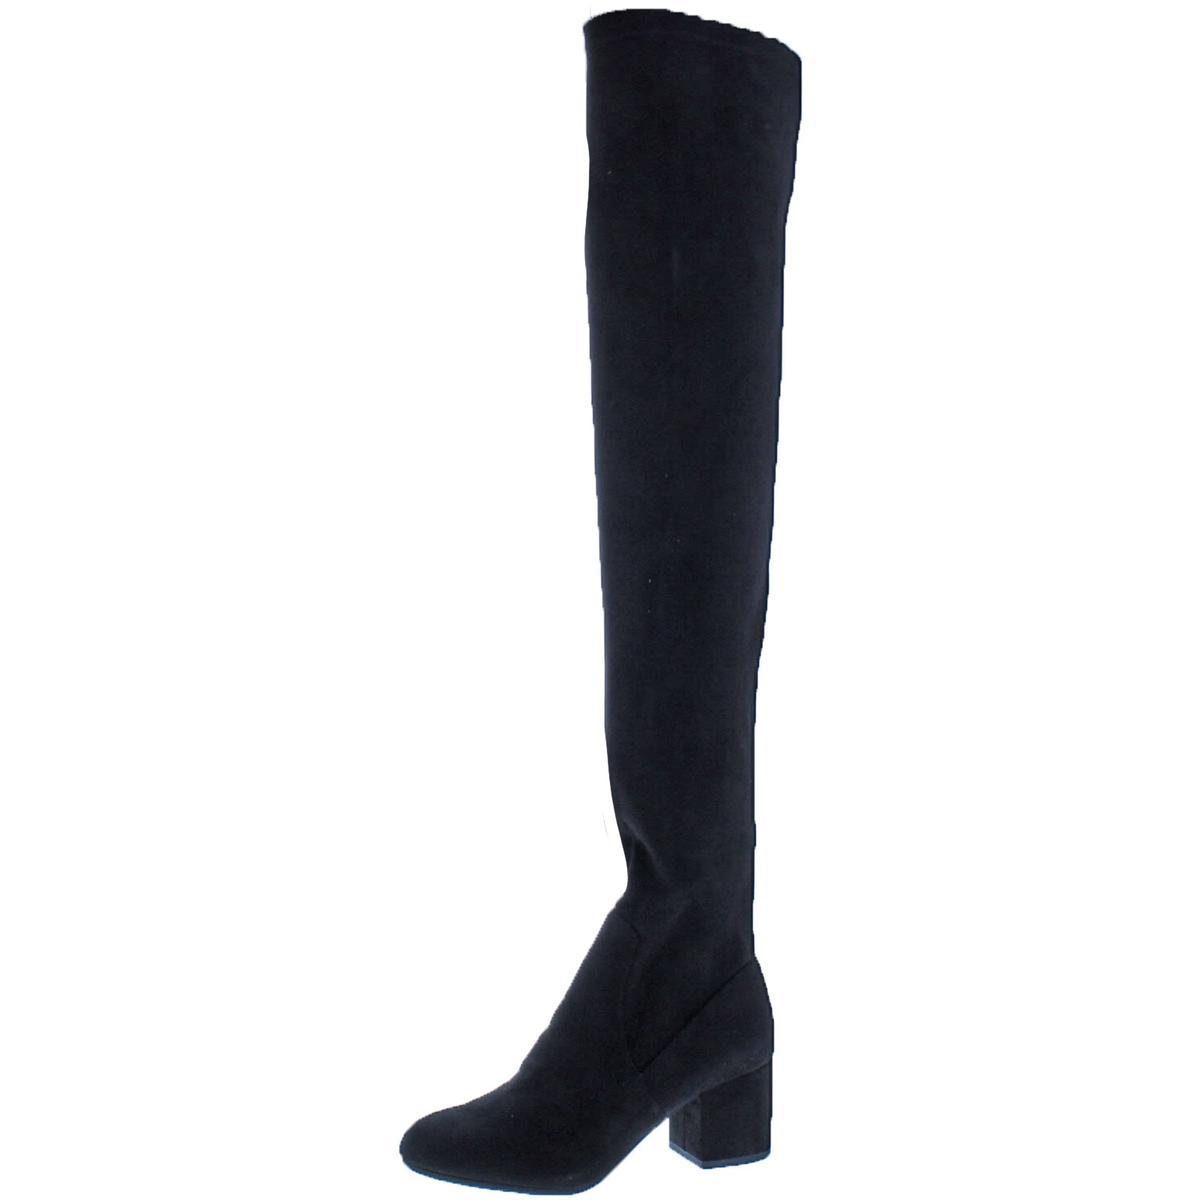 d803342bb44 Details about Steve Madden Womens Isaac Black Over-The-Knee Boots 6 Medium  (B